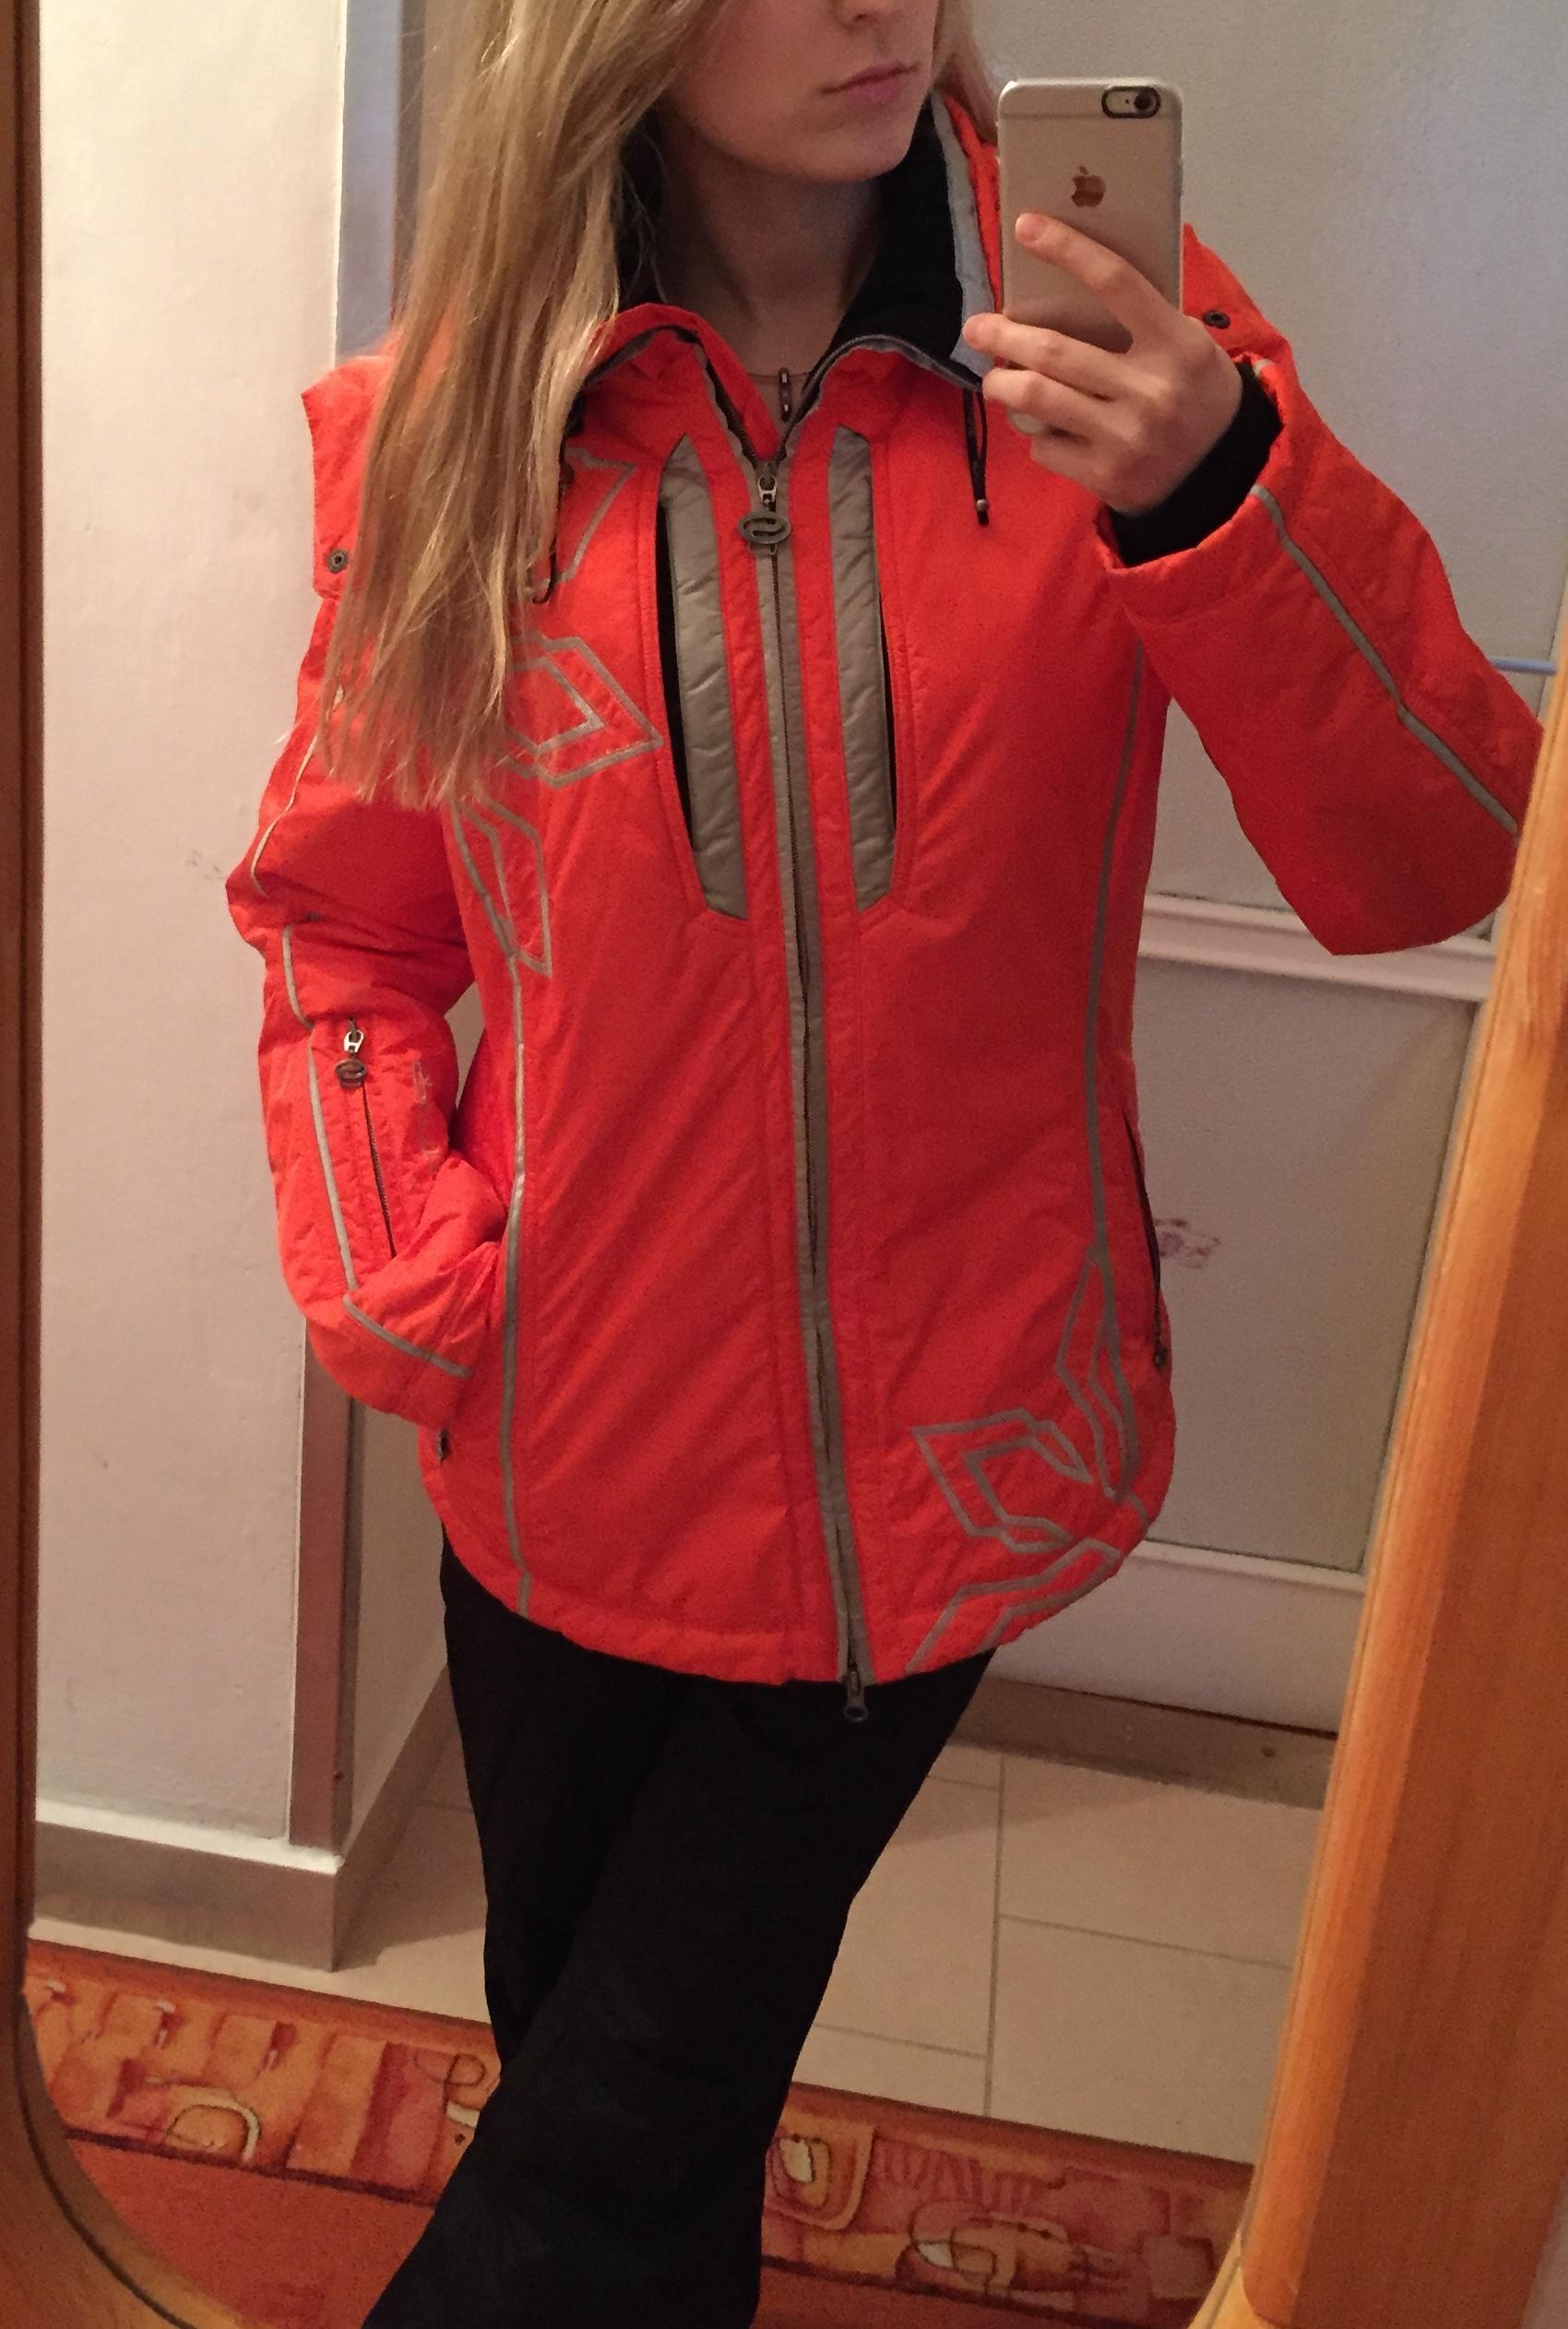 Dámská lyžařská bunda Sportalm vel. S - Bazar - SNOW.CZ 4f9c2f3080